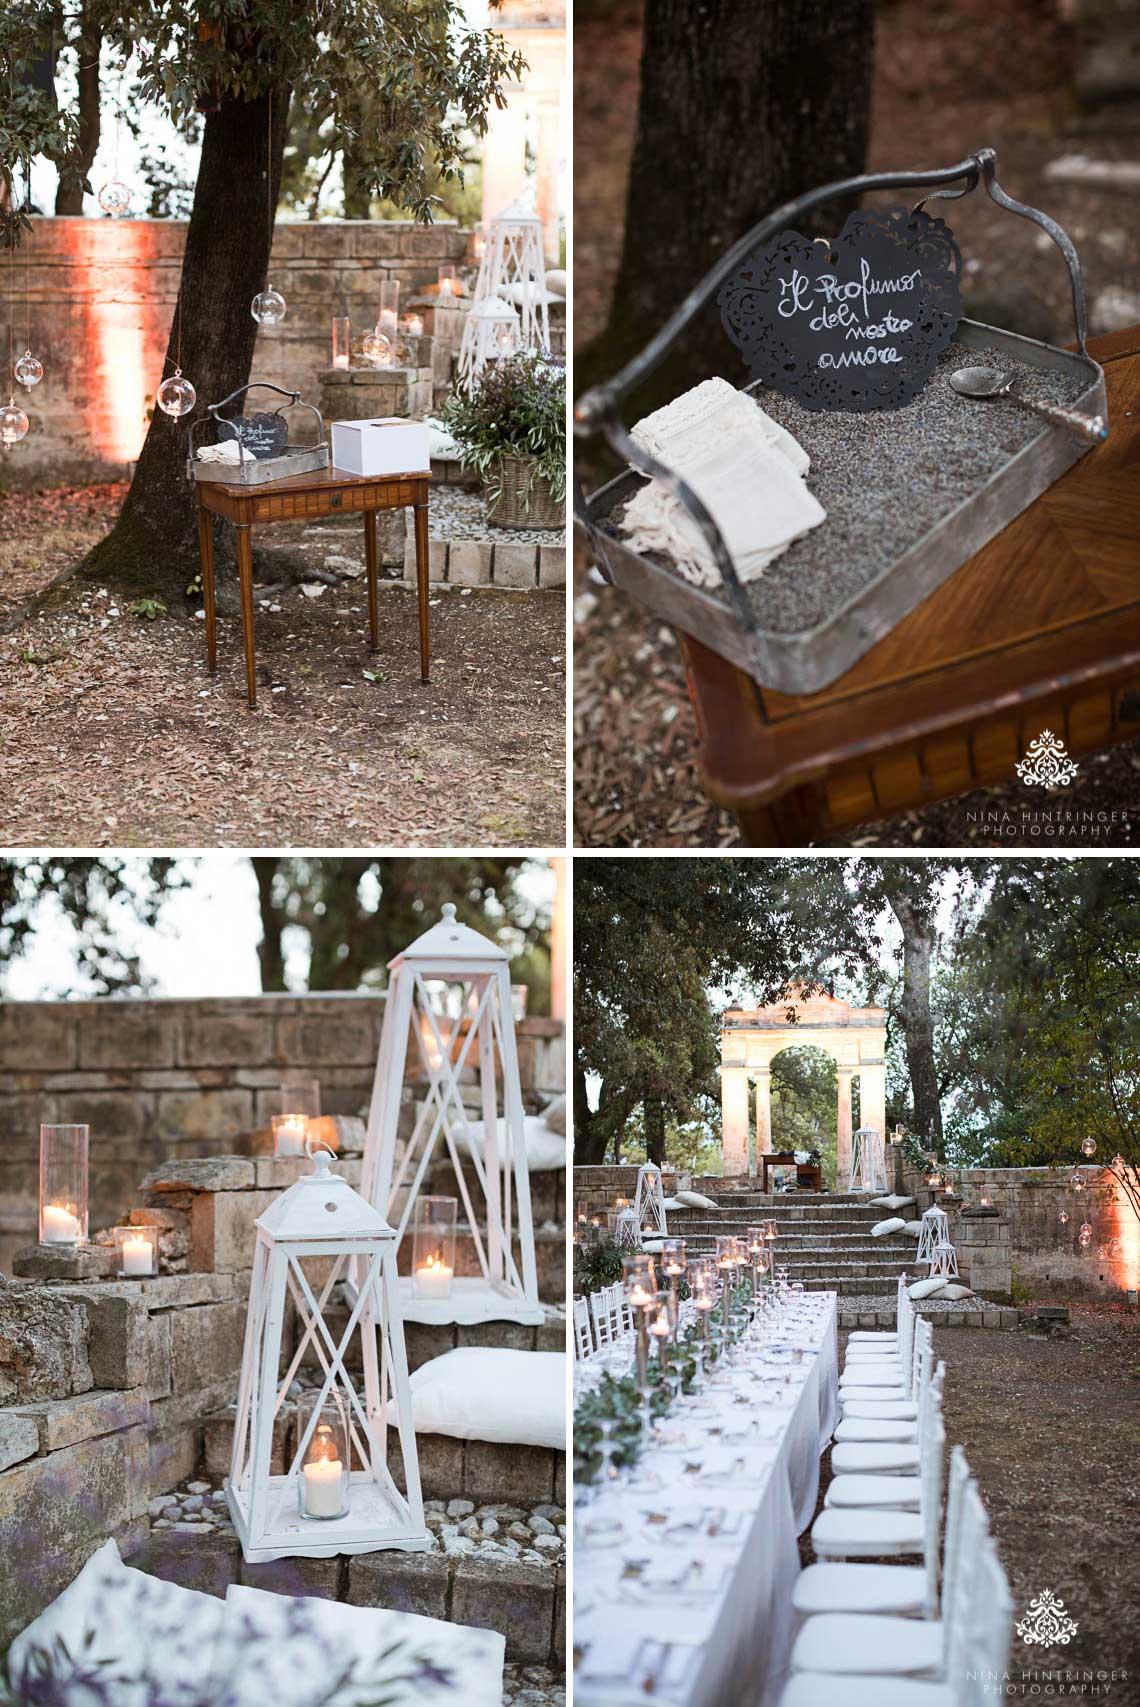 Villa Pianciani Wedding in Spoleto, Italy | Tuscany Wedding Photographer - Blog of Nina Hintringer Photography - Wedding Photography, Wedding Reportage and Destination Weddings